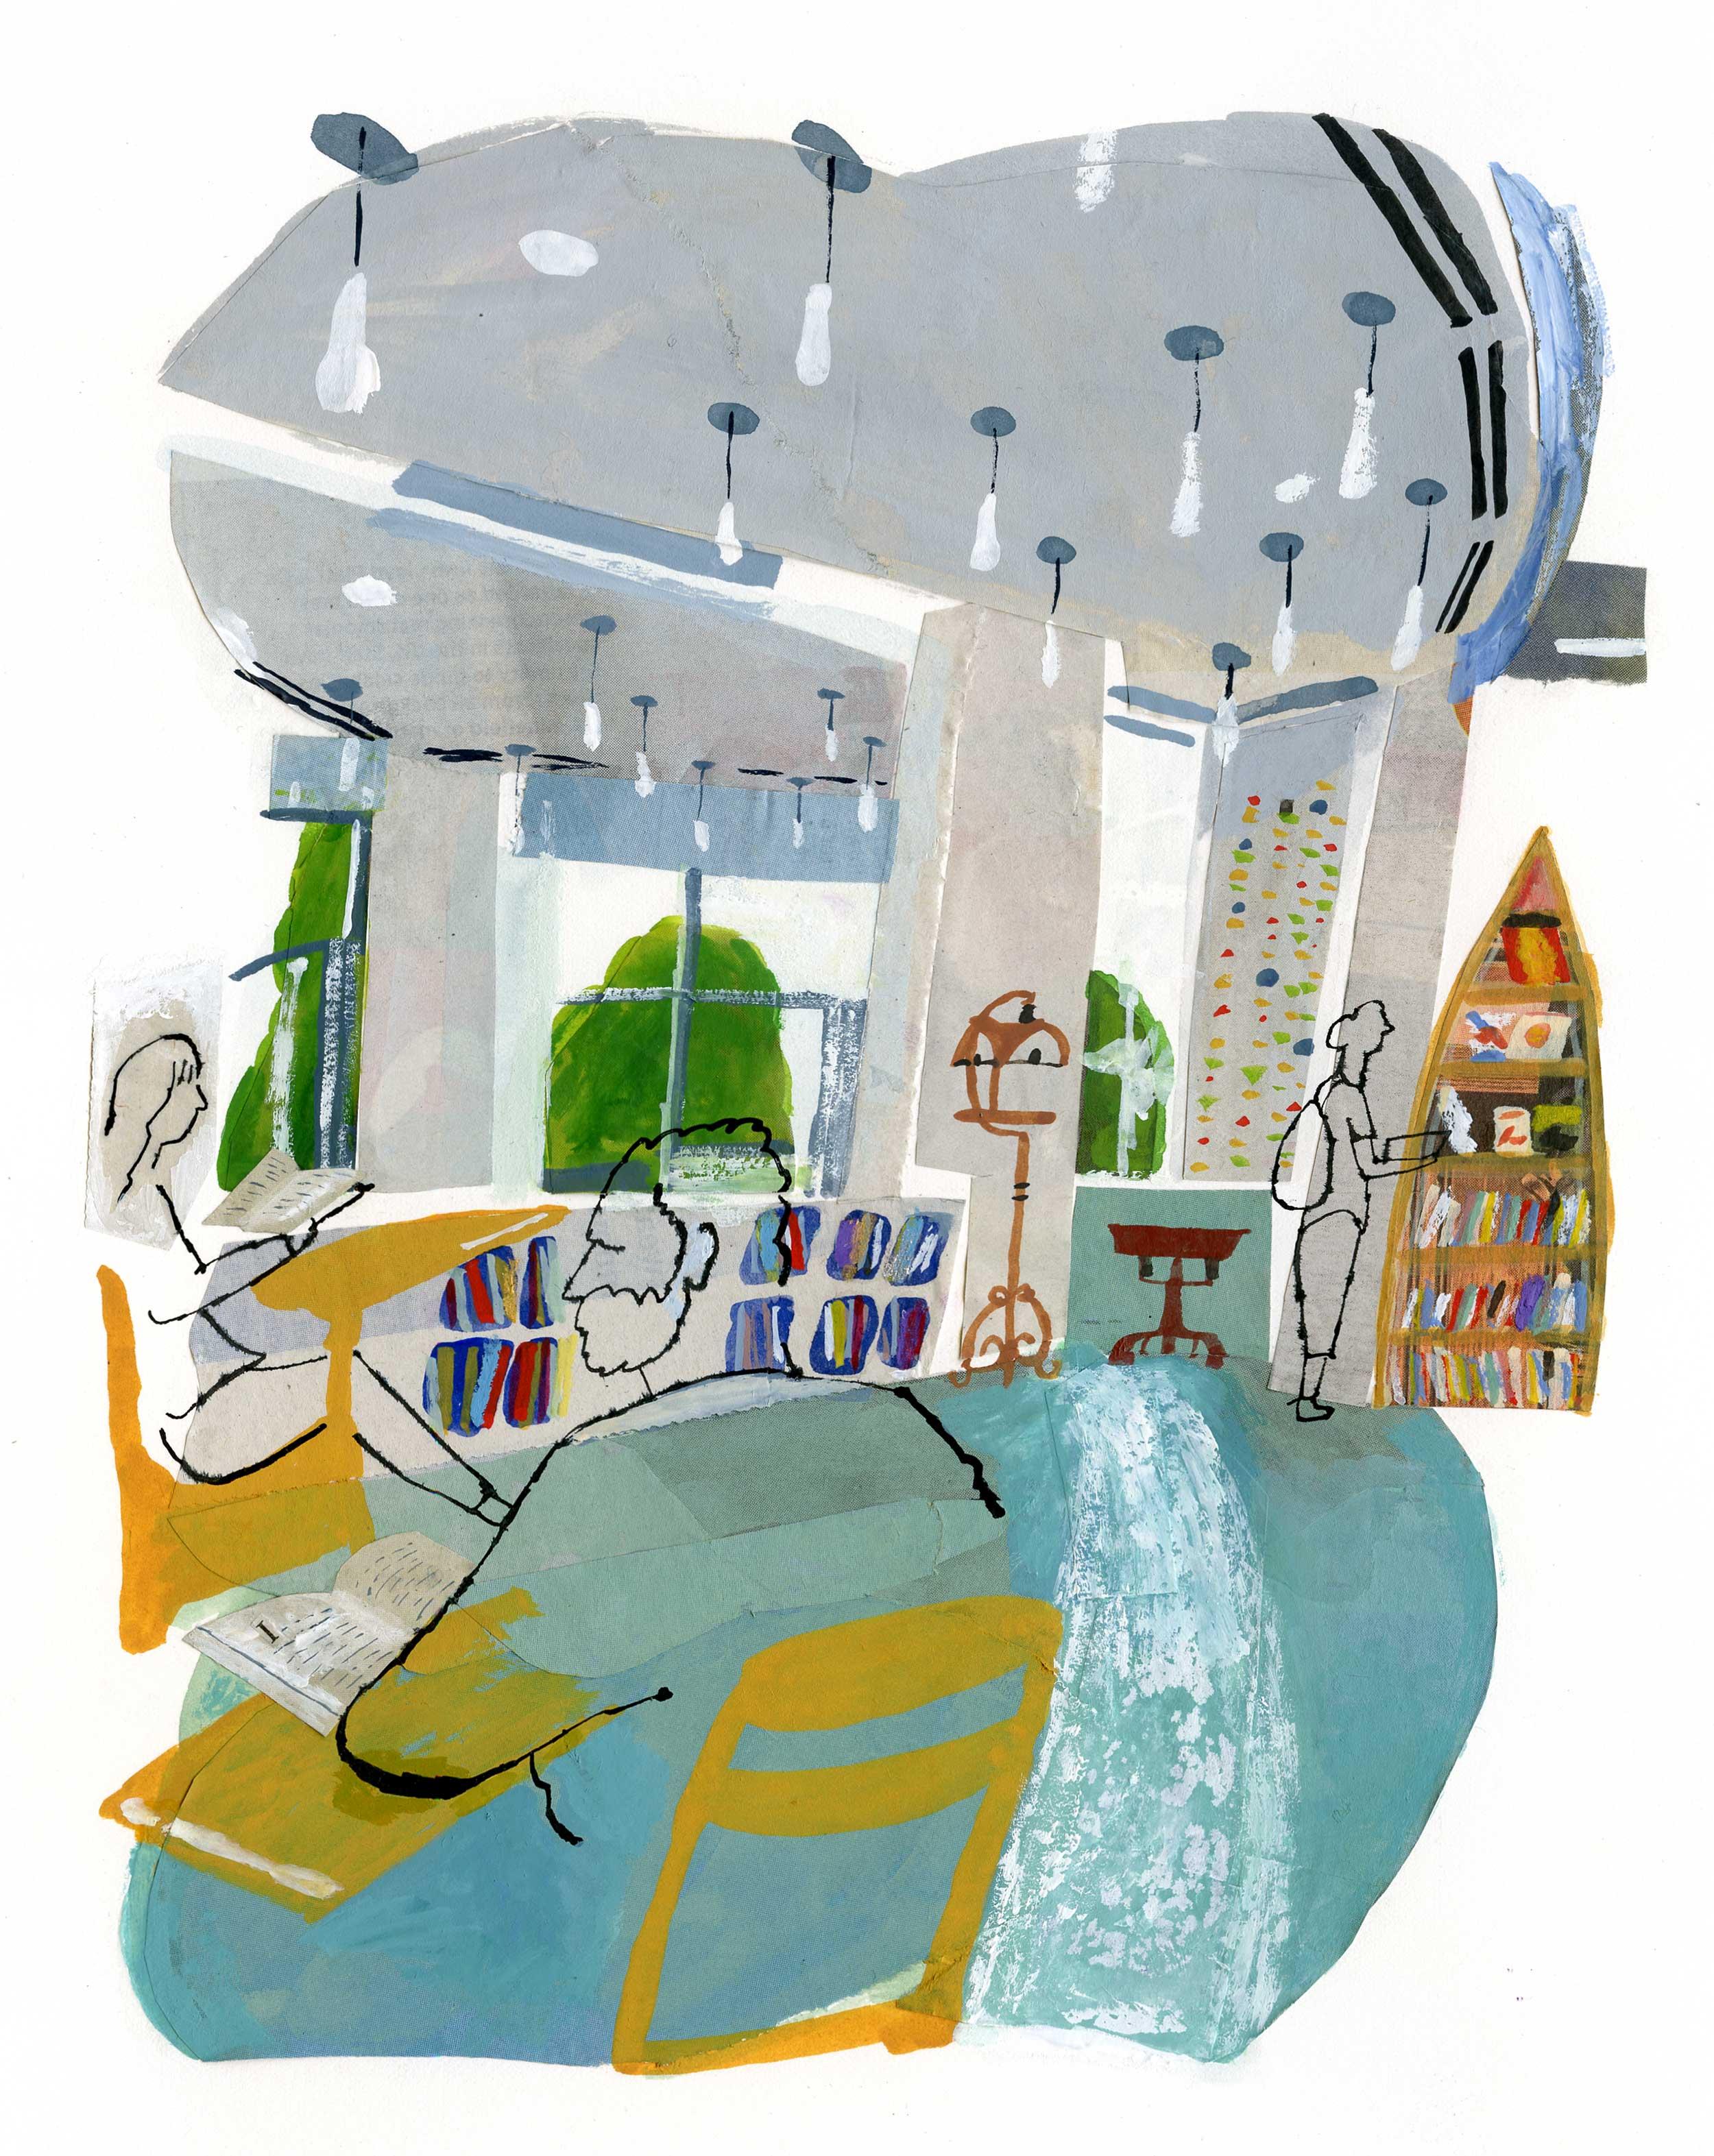 St Regis Beyond illustrations by James Oses, image 10